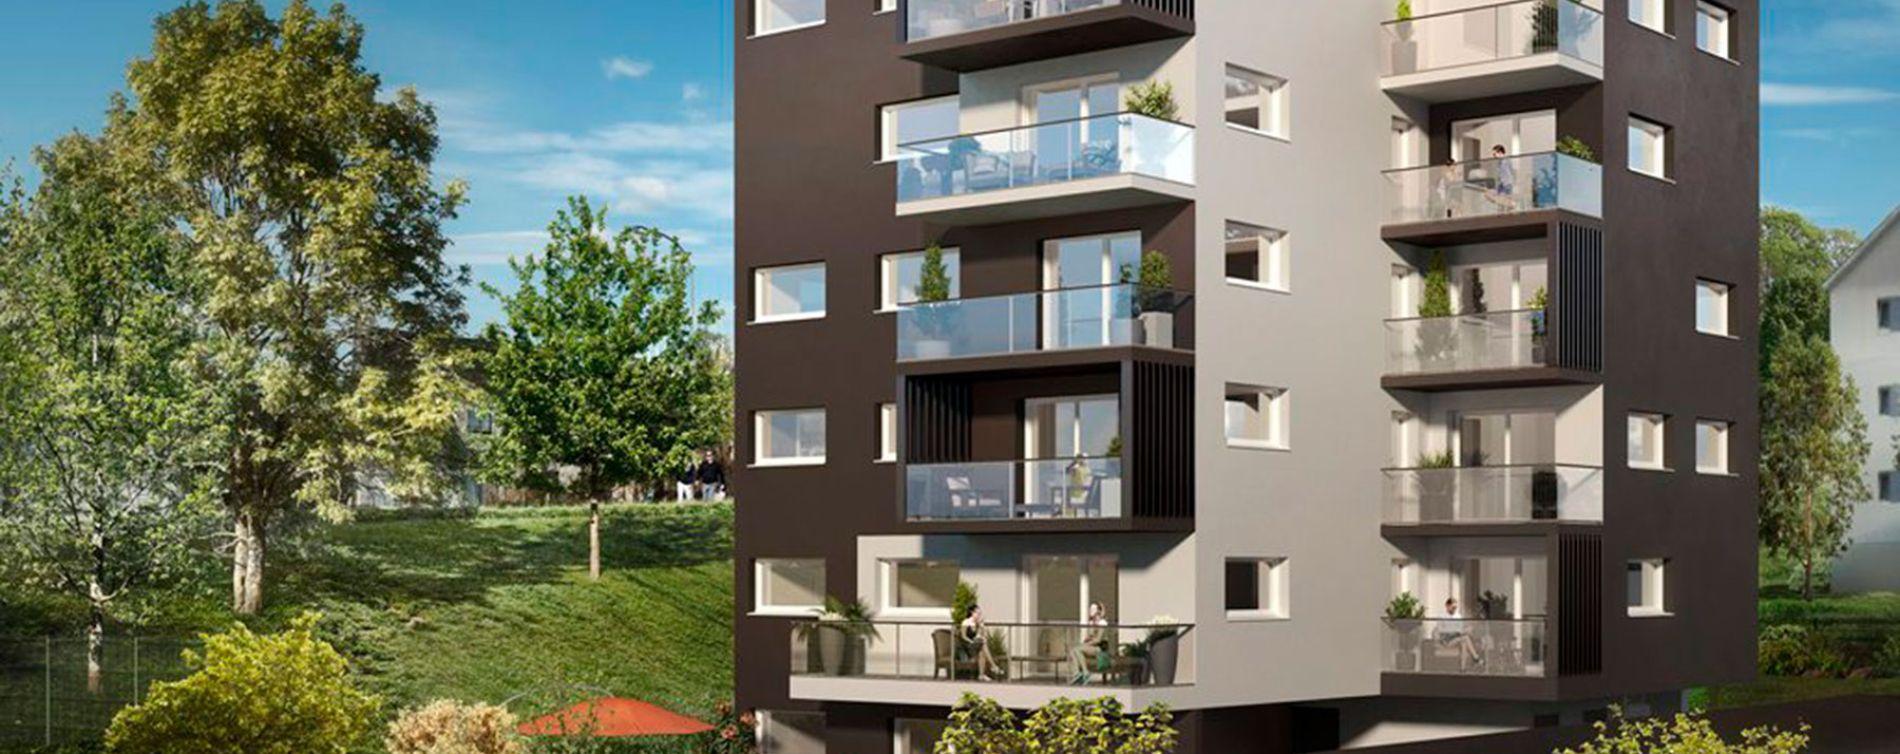 Landerneau programme immobilier neuve « L'Aristide »